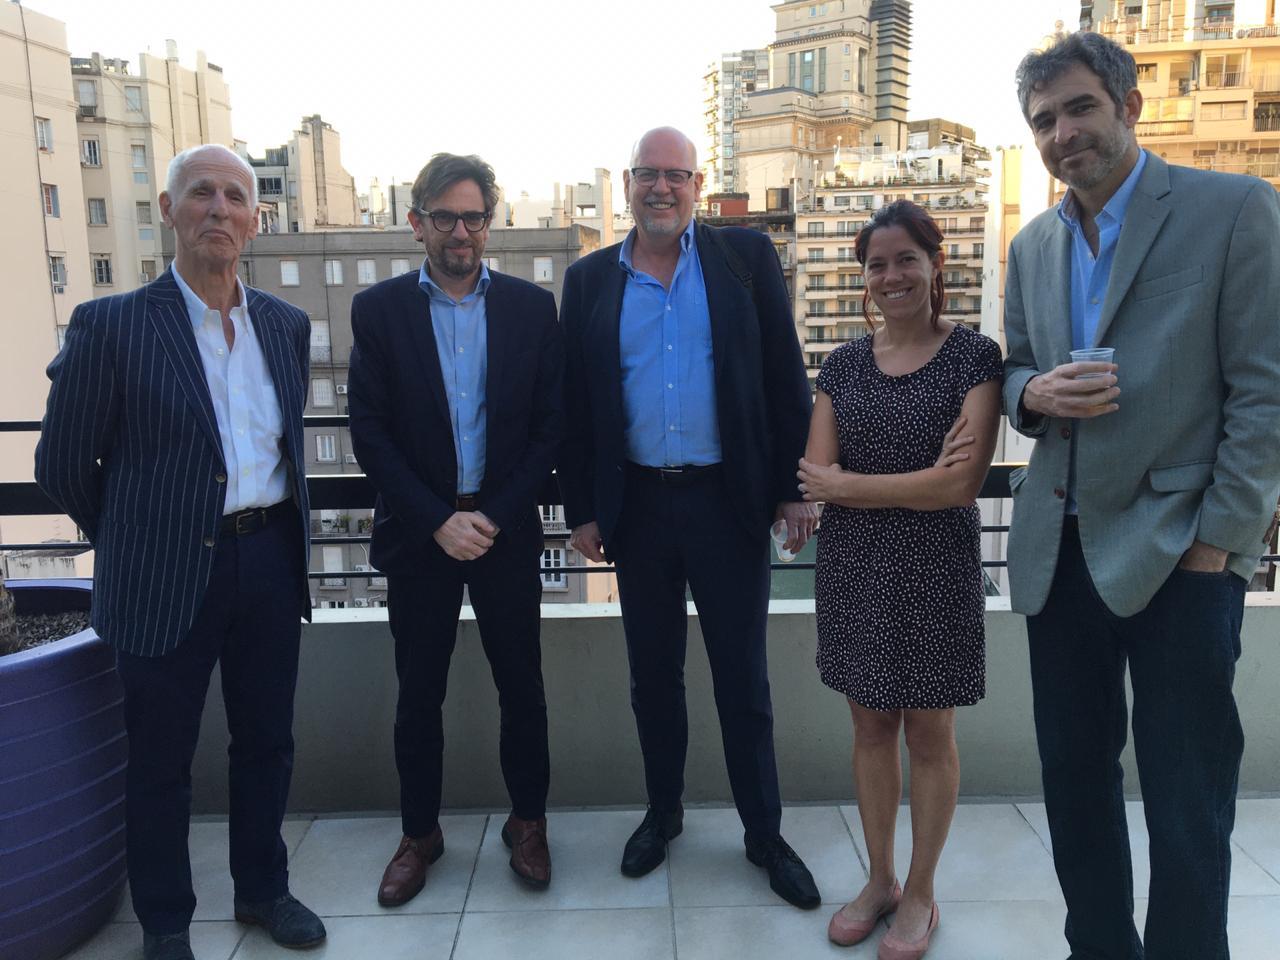 Jaime Malamud Goti, Consejero Académico; Raúl Ferro, Brian Schapira, Cecilia Noce e Ignacio Labaqui.